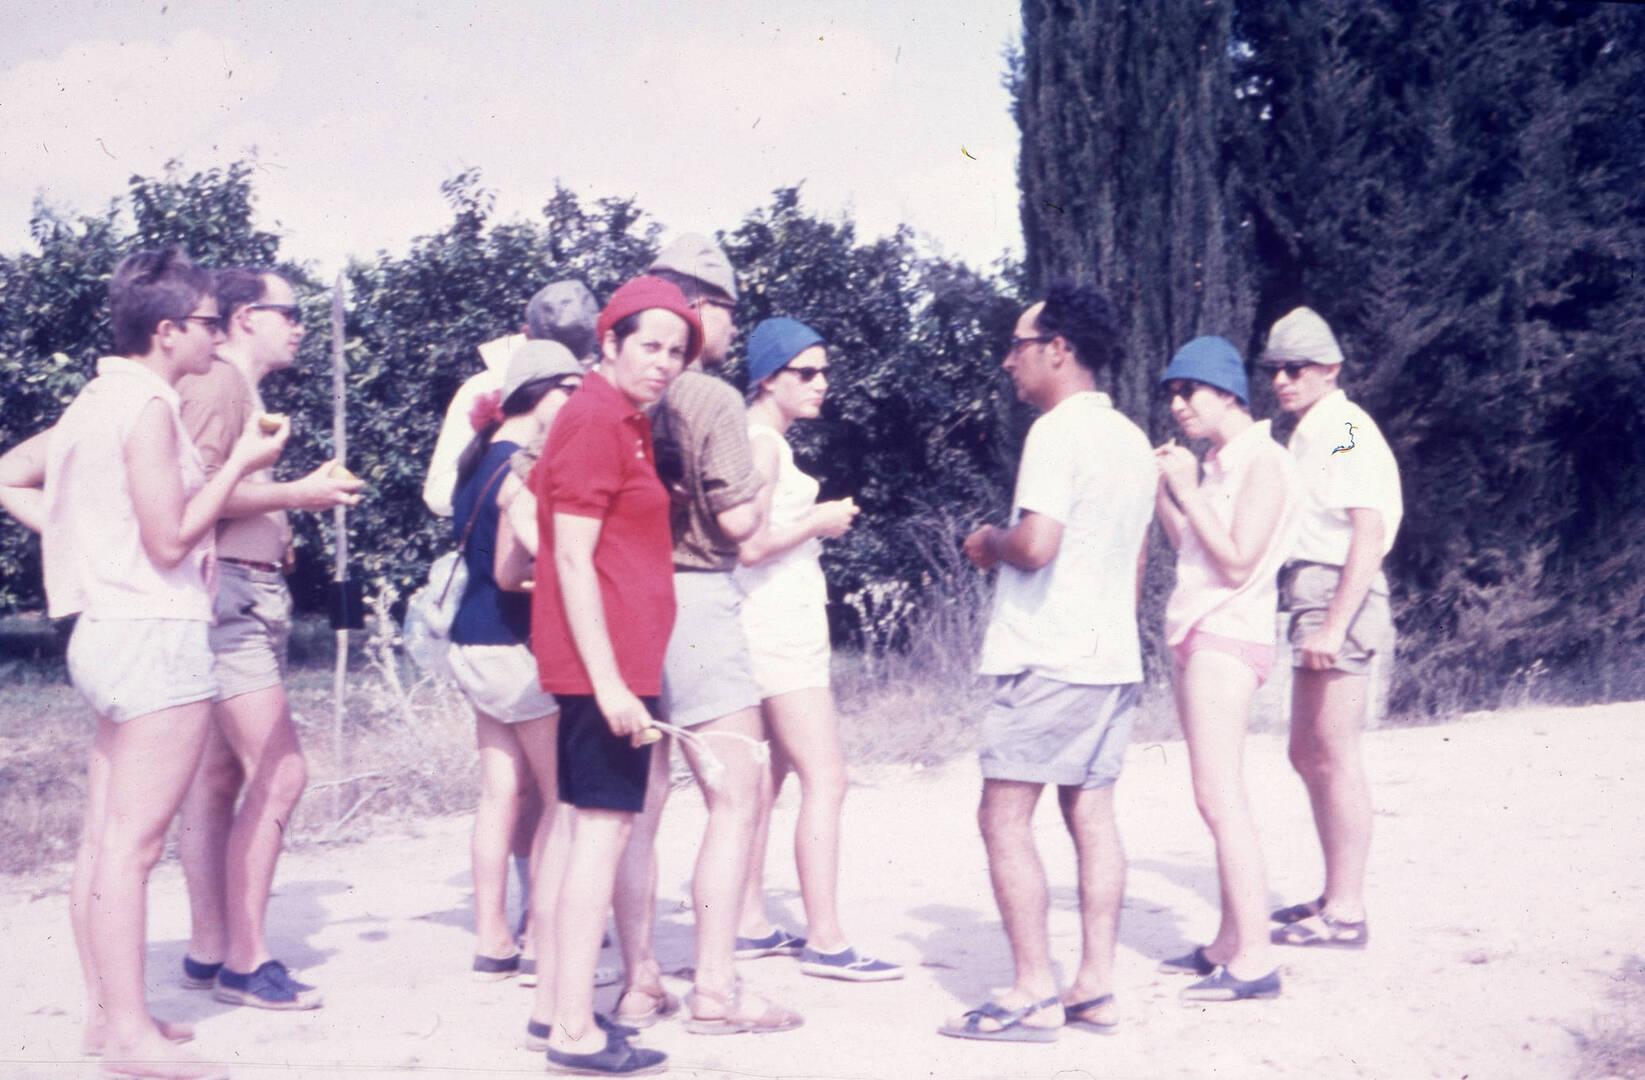 Diasammlung Fabritius - Kibbuz 1966 - Bild privat.jpg